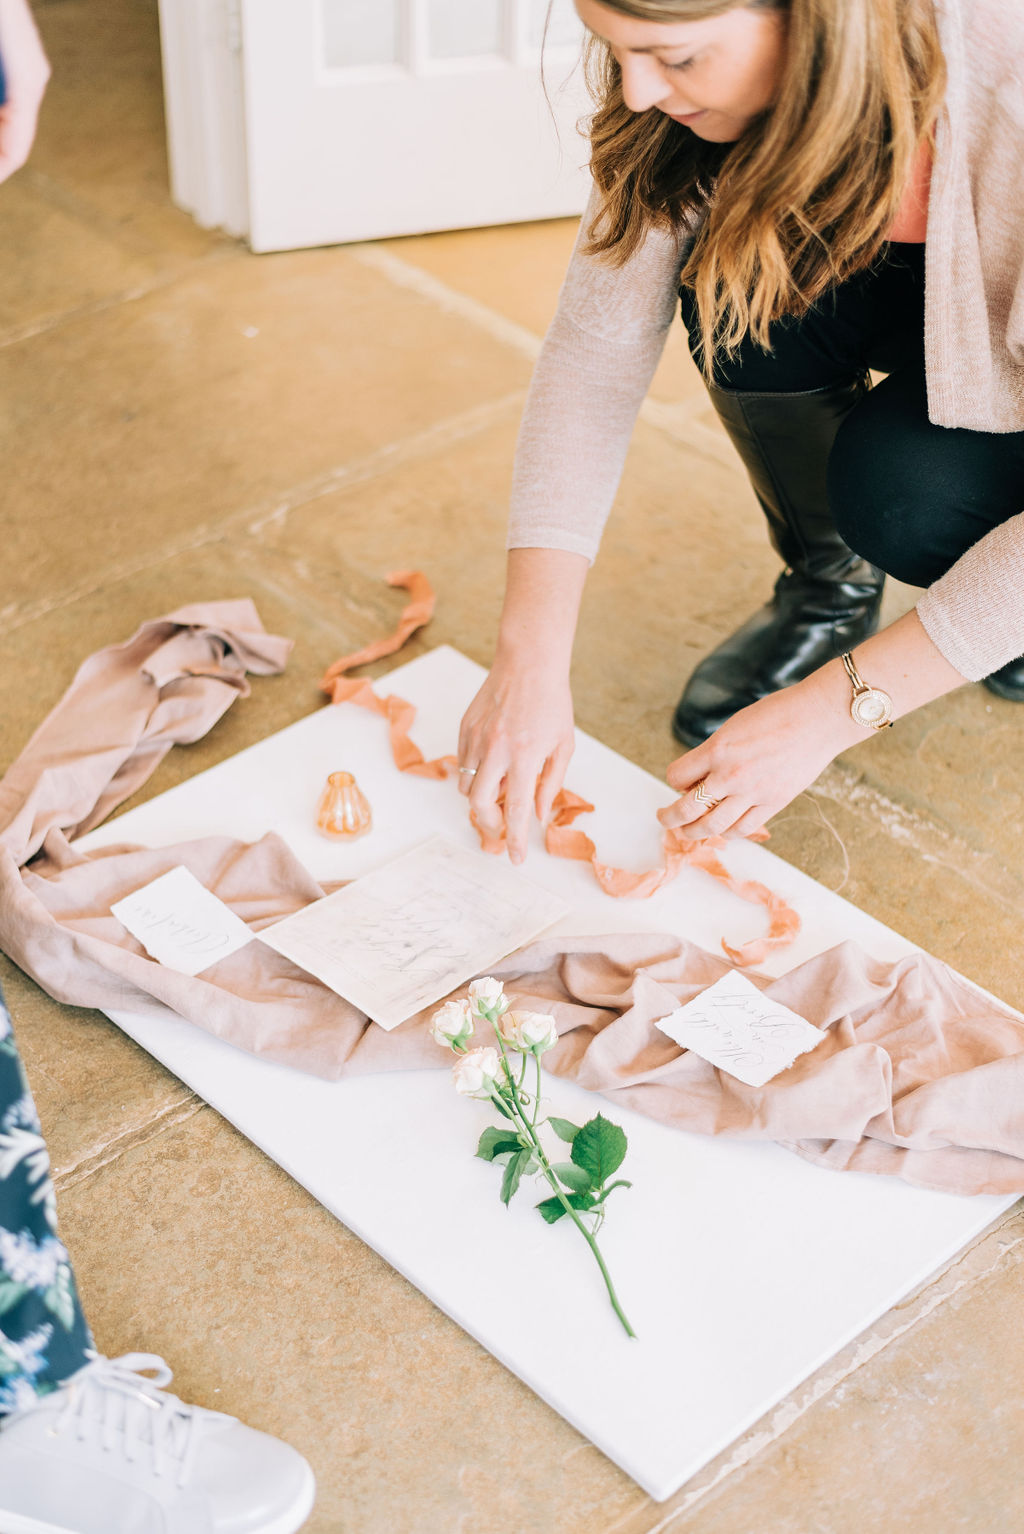 Carolyn Louise Weddings, Styling your wedding day